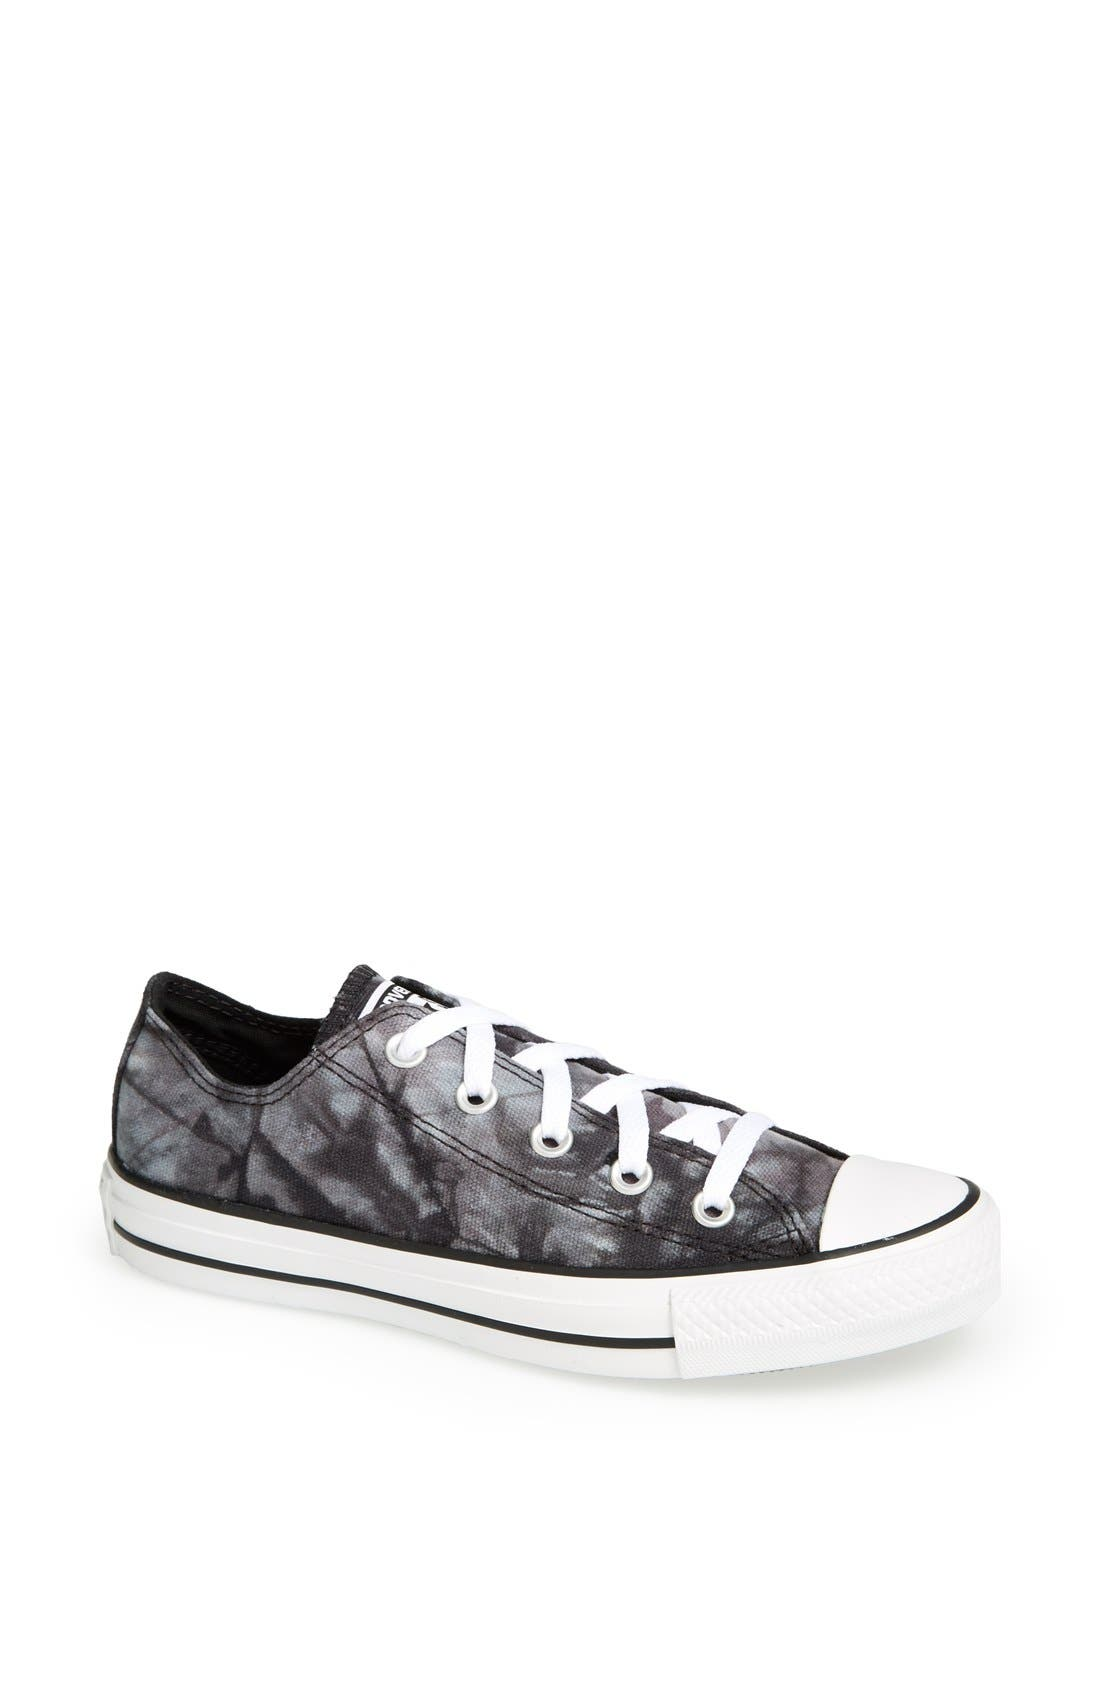 Main Image - Converse Chuck Taylor® All Star® 'Ox' Tie Dye Low Top Sneaker (Women)